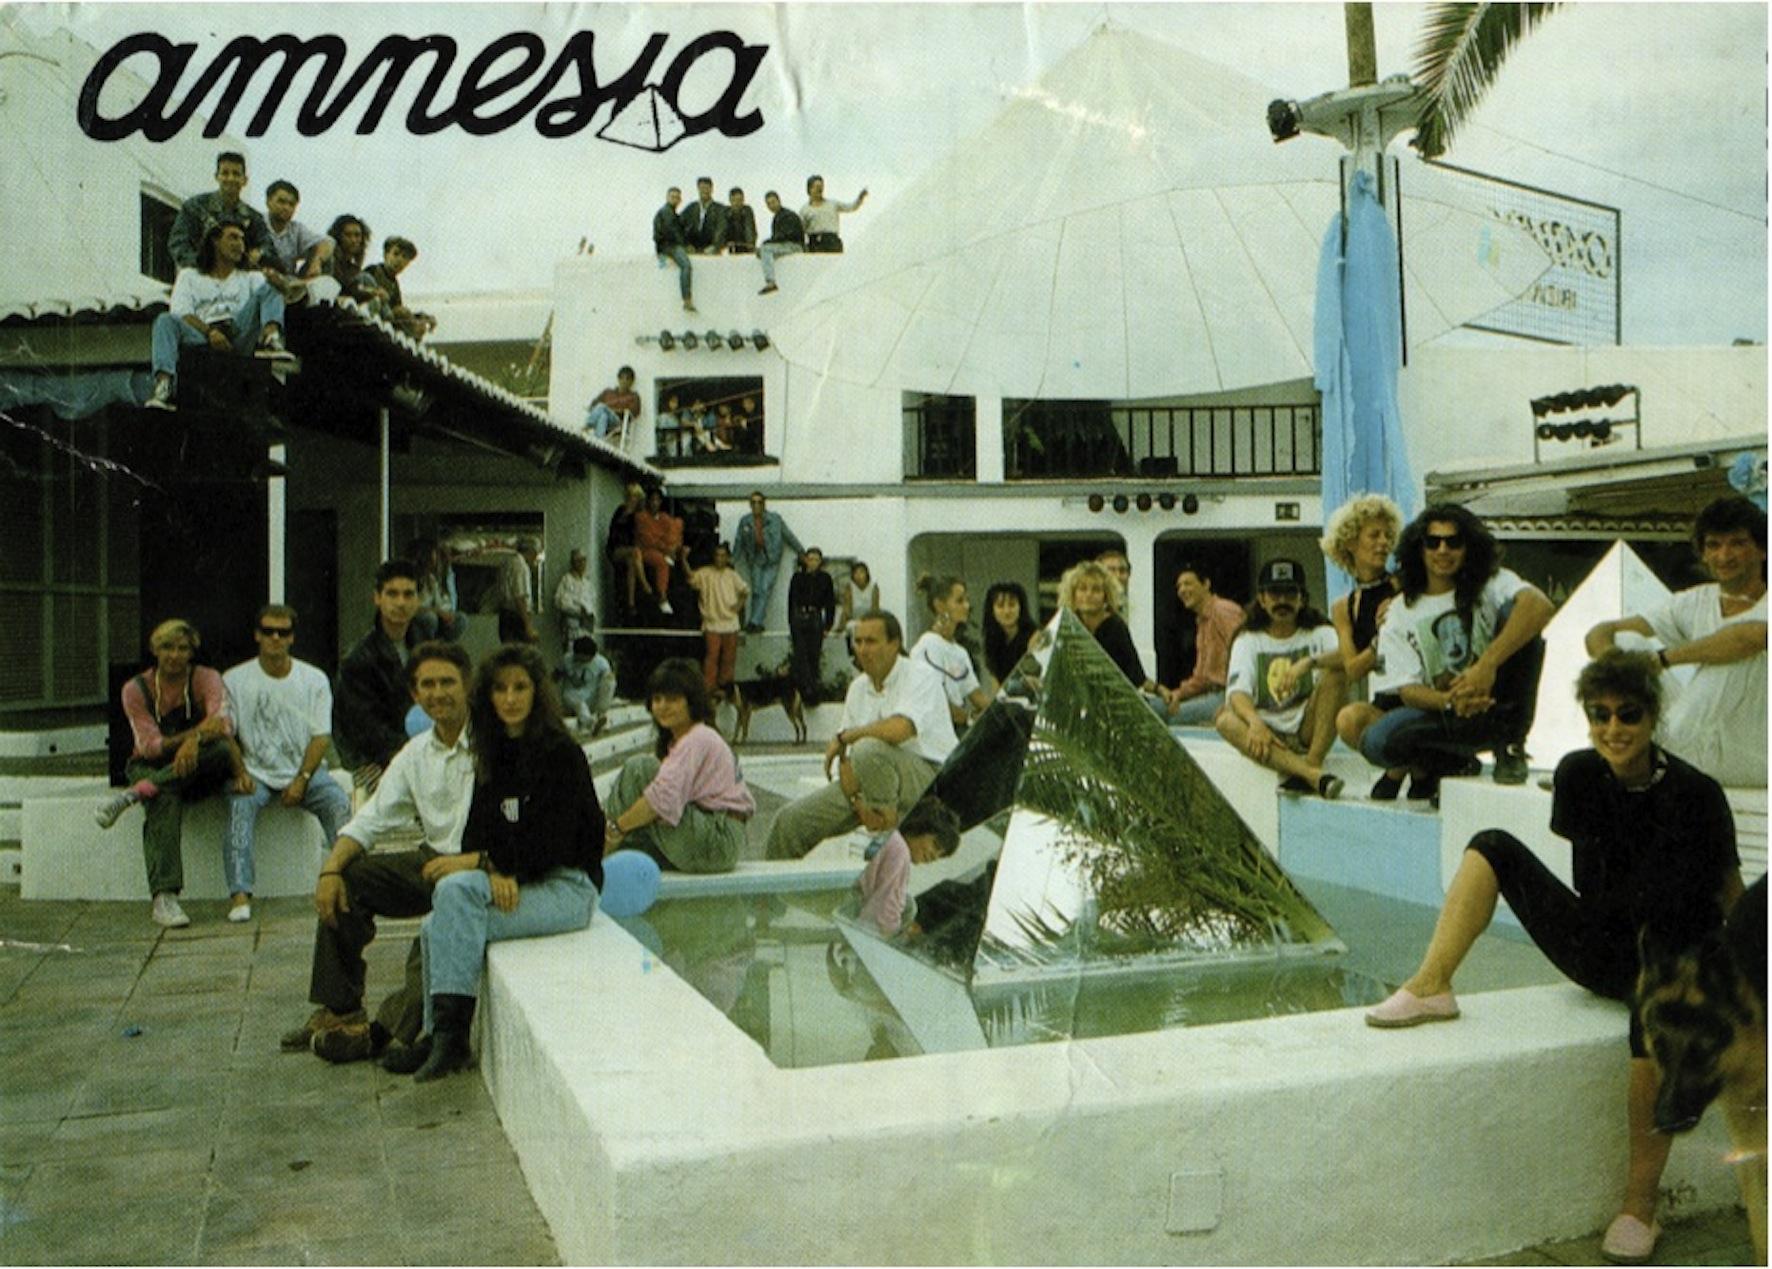 Test Pressing, Interview, 20 Questions, Dr Rob, Leo Mas, Amnesia, Ibiza, Italy, Movida, Go! Bang, Fluid